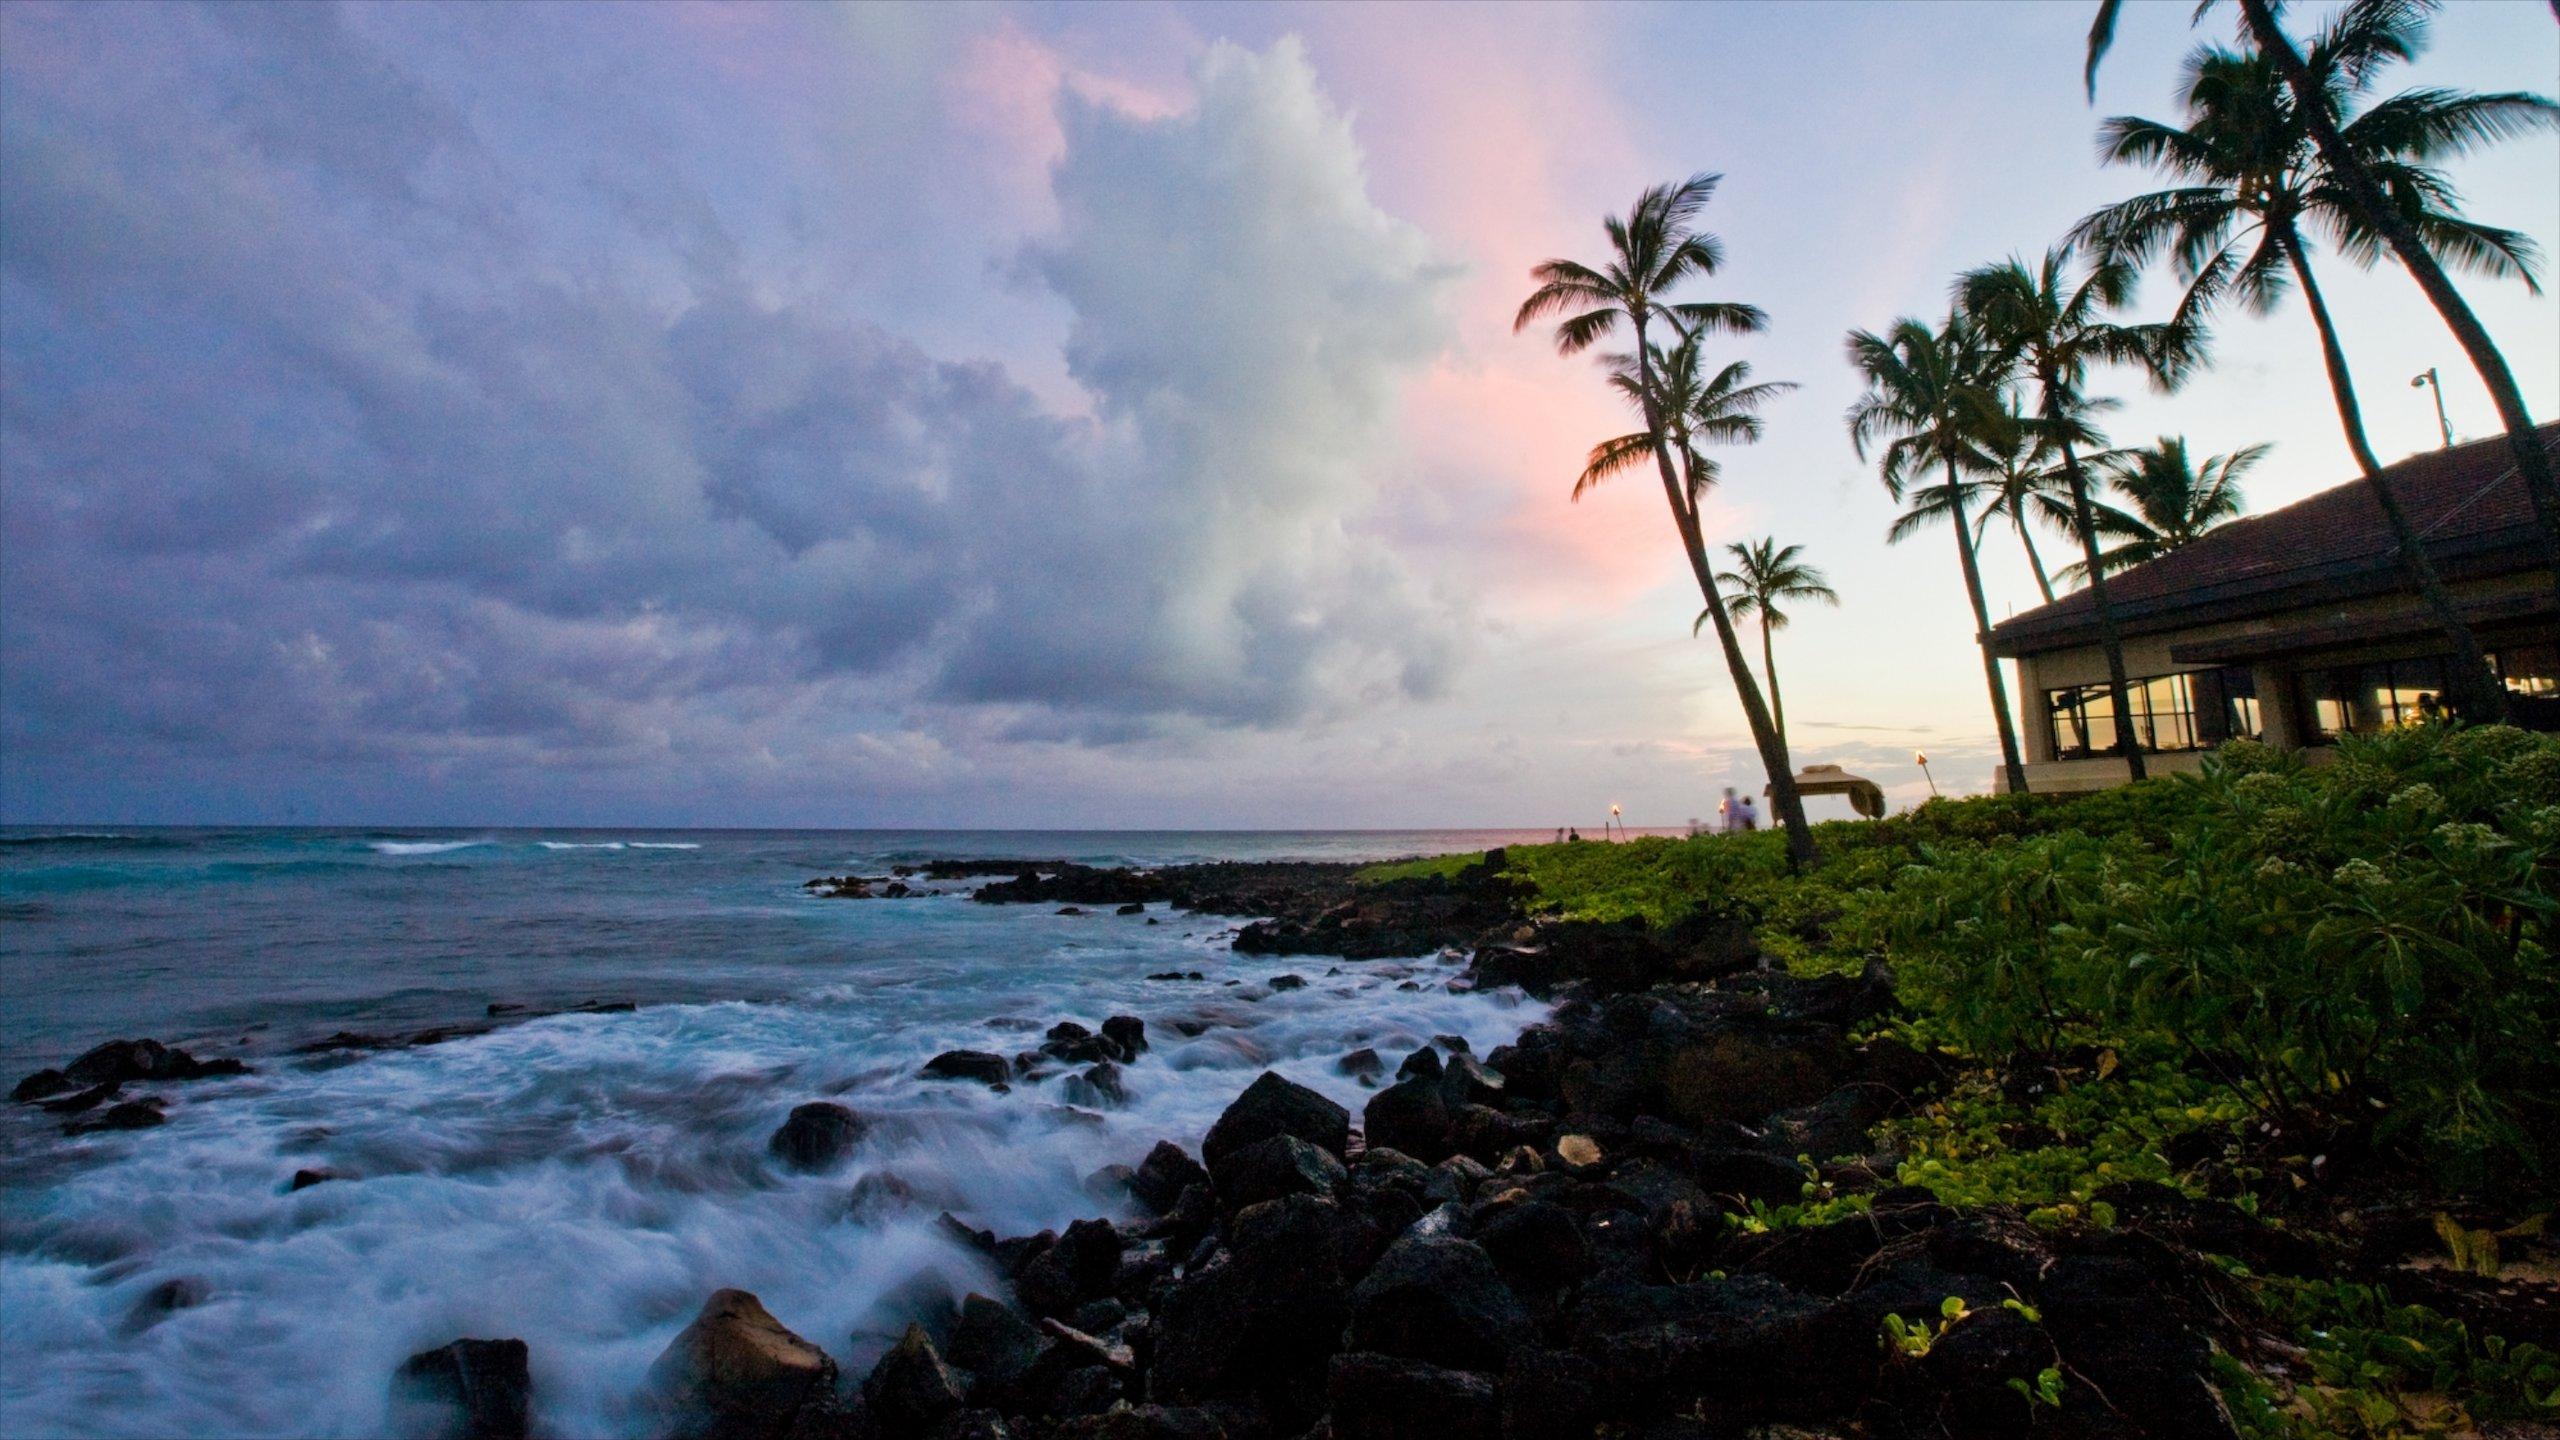 Poipu, Koloa, Hawaii, United States of America